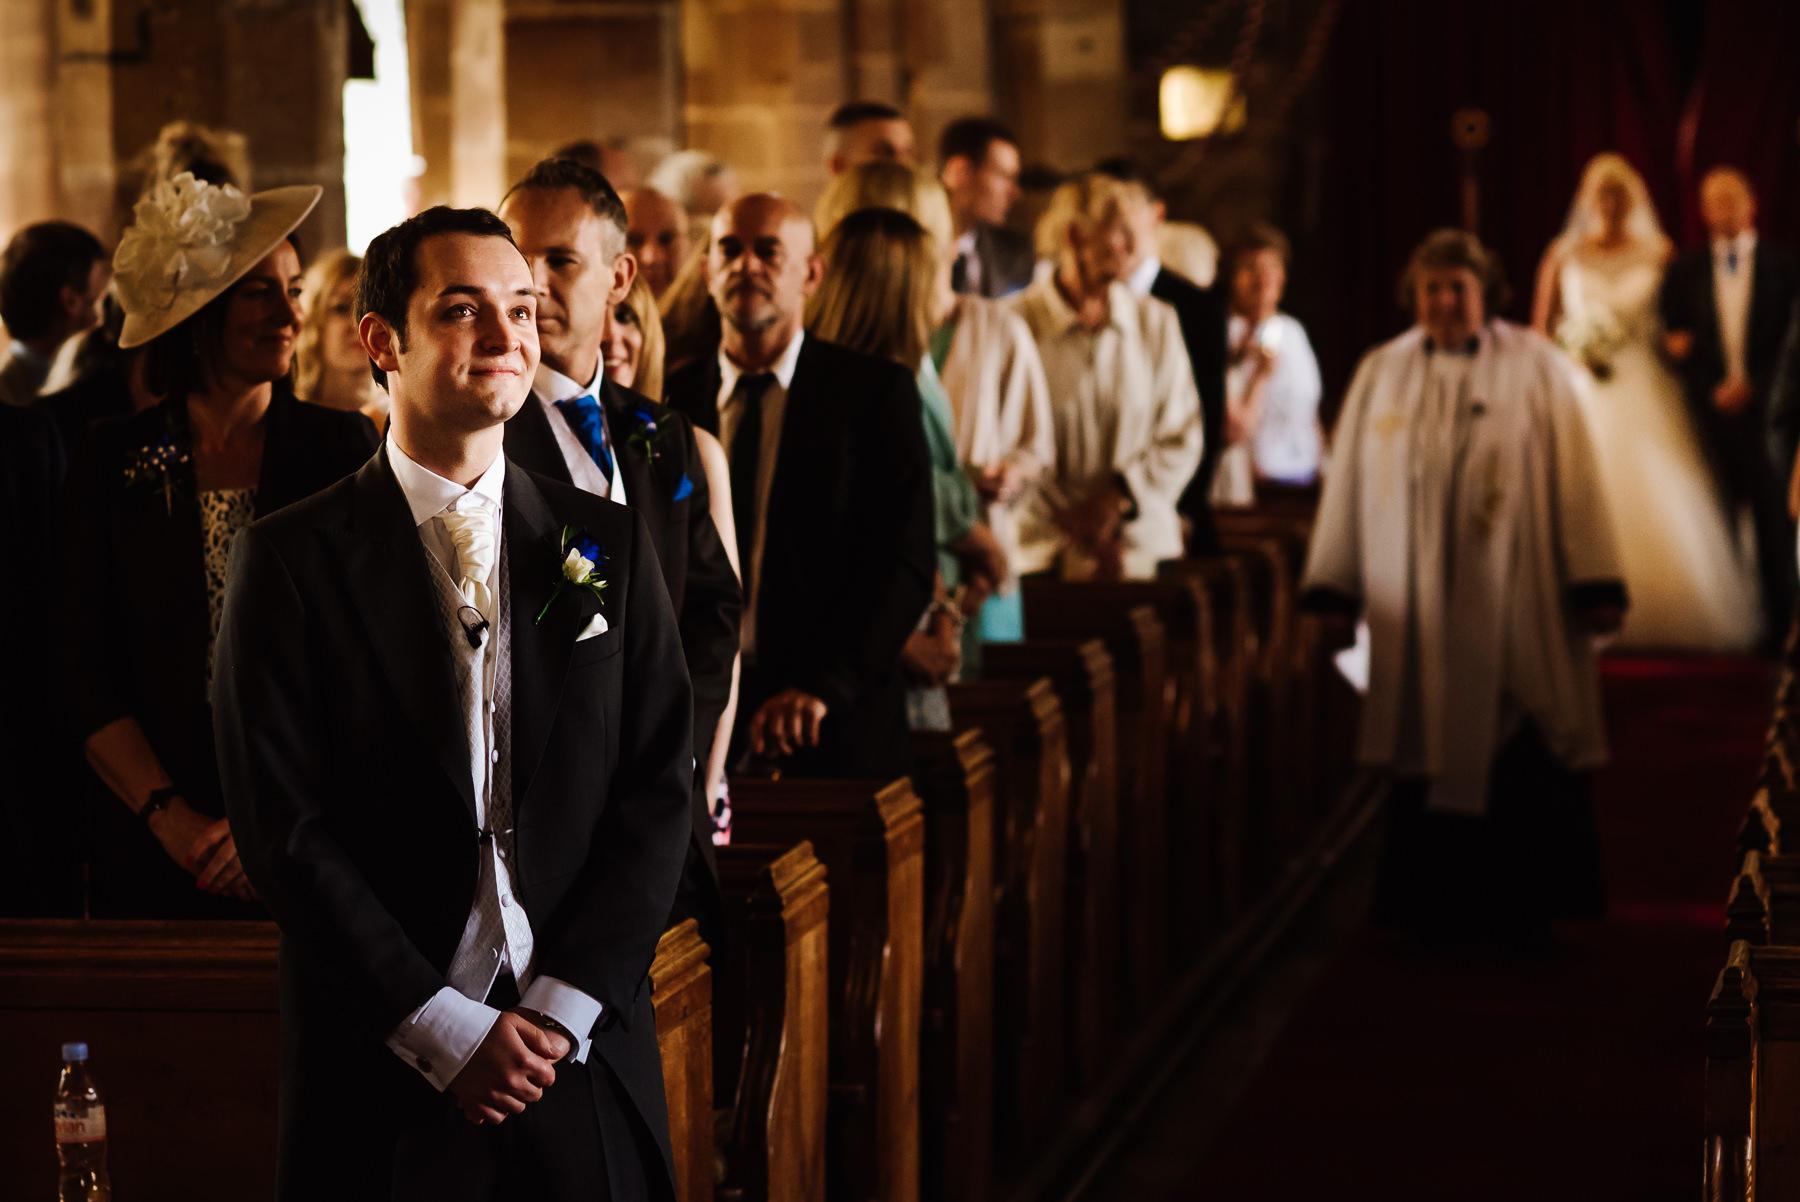 An anxious groom waits for his bride in the church